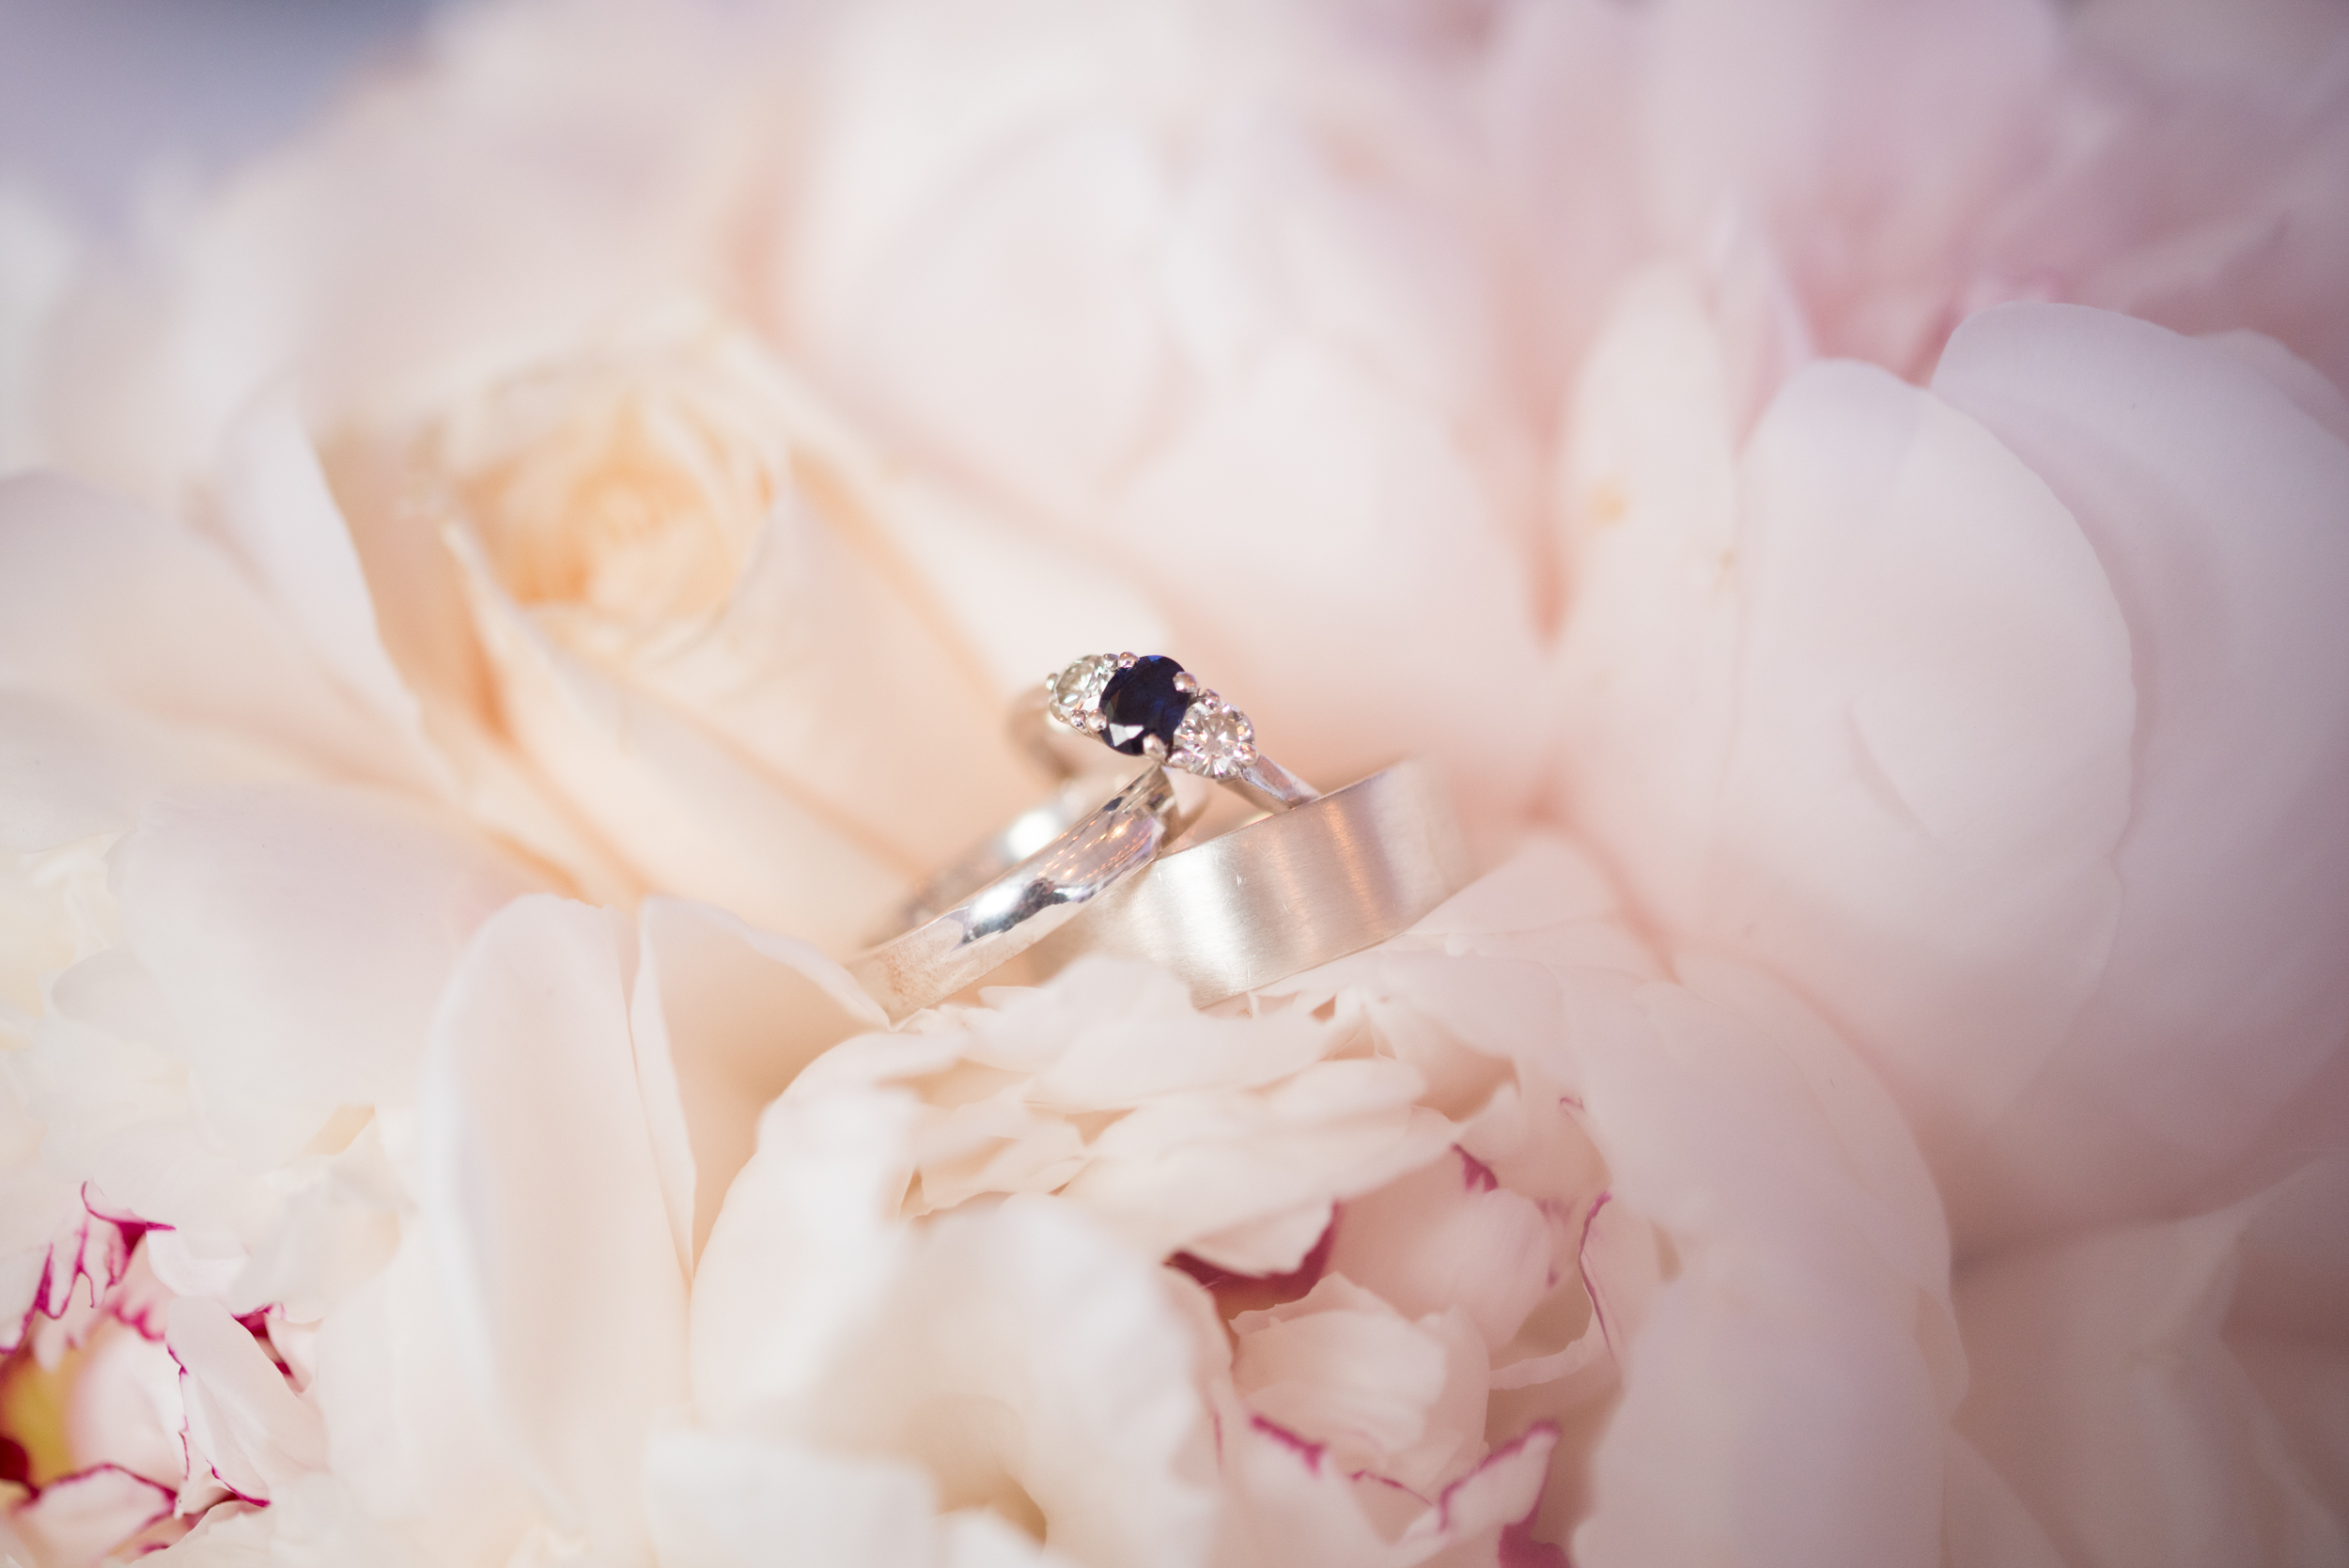 Toronto Wedding rings at Airship 37 with Soundslikeyellowphotography